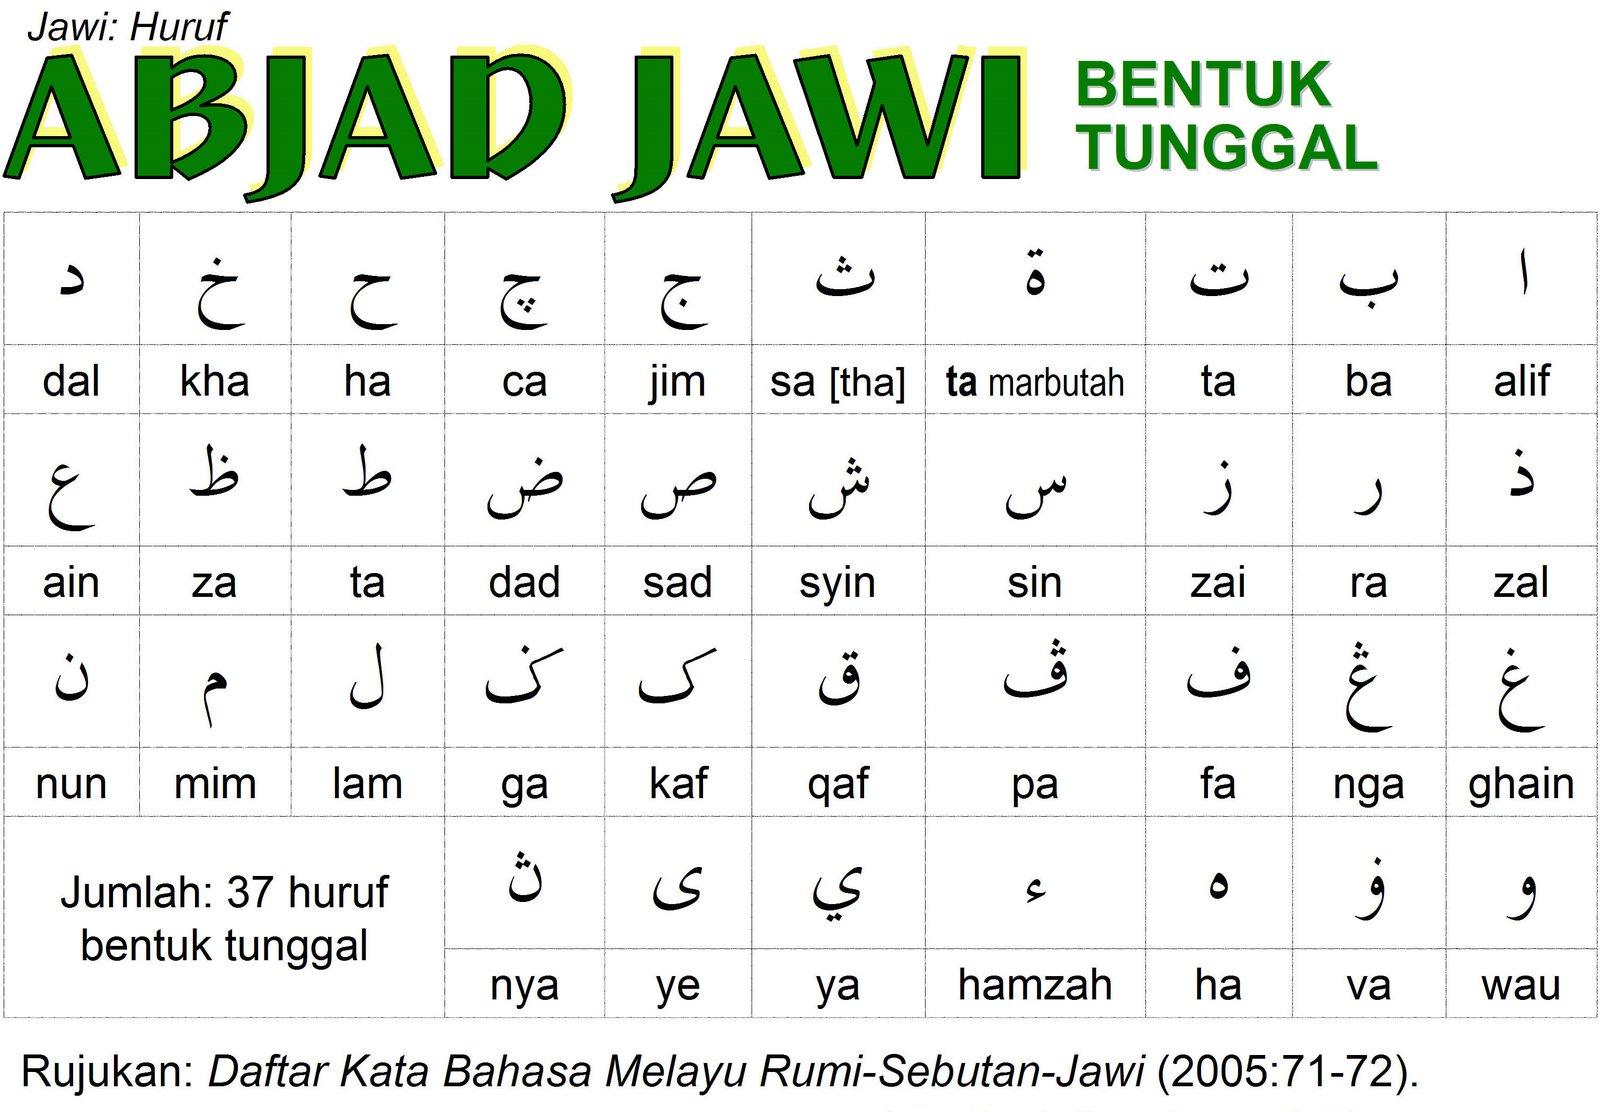 Citaten Rumi Jawi : Sejauh mana kemahiran jawi anda anajingga